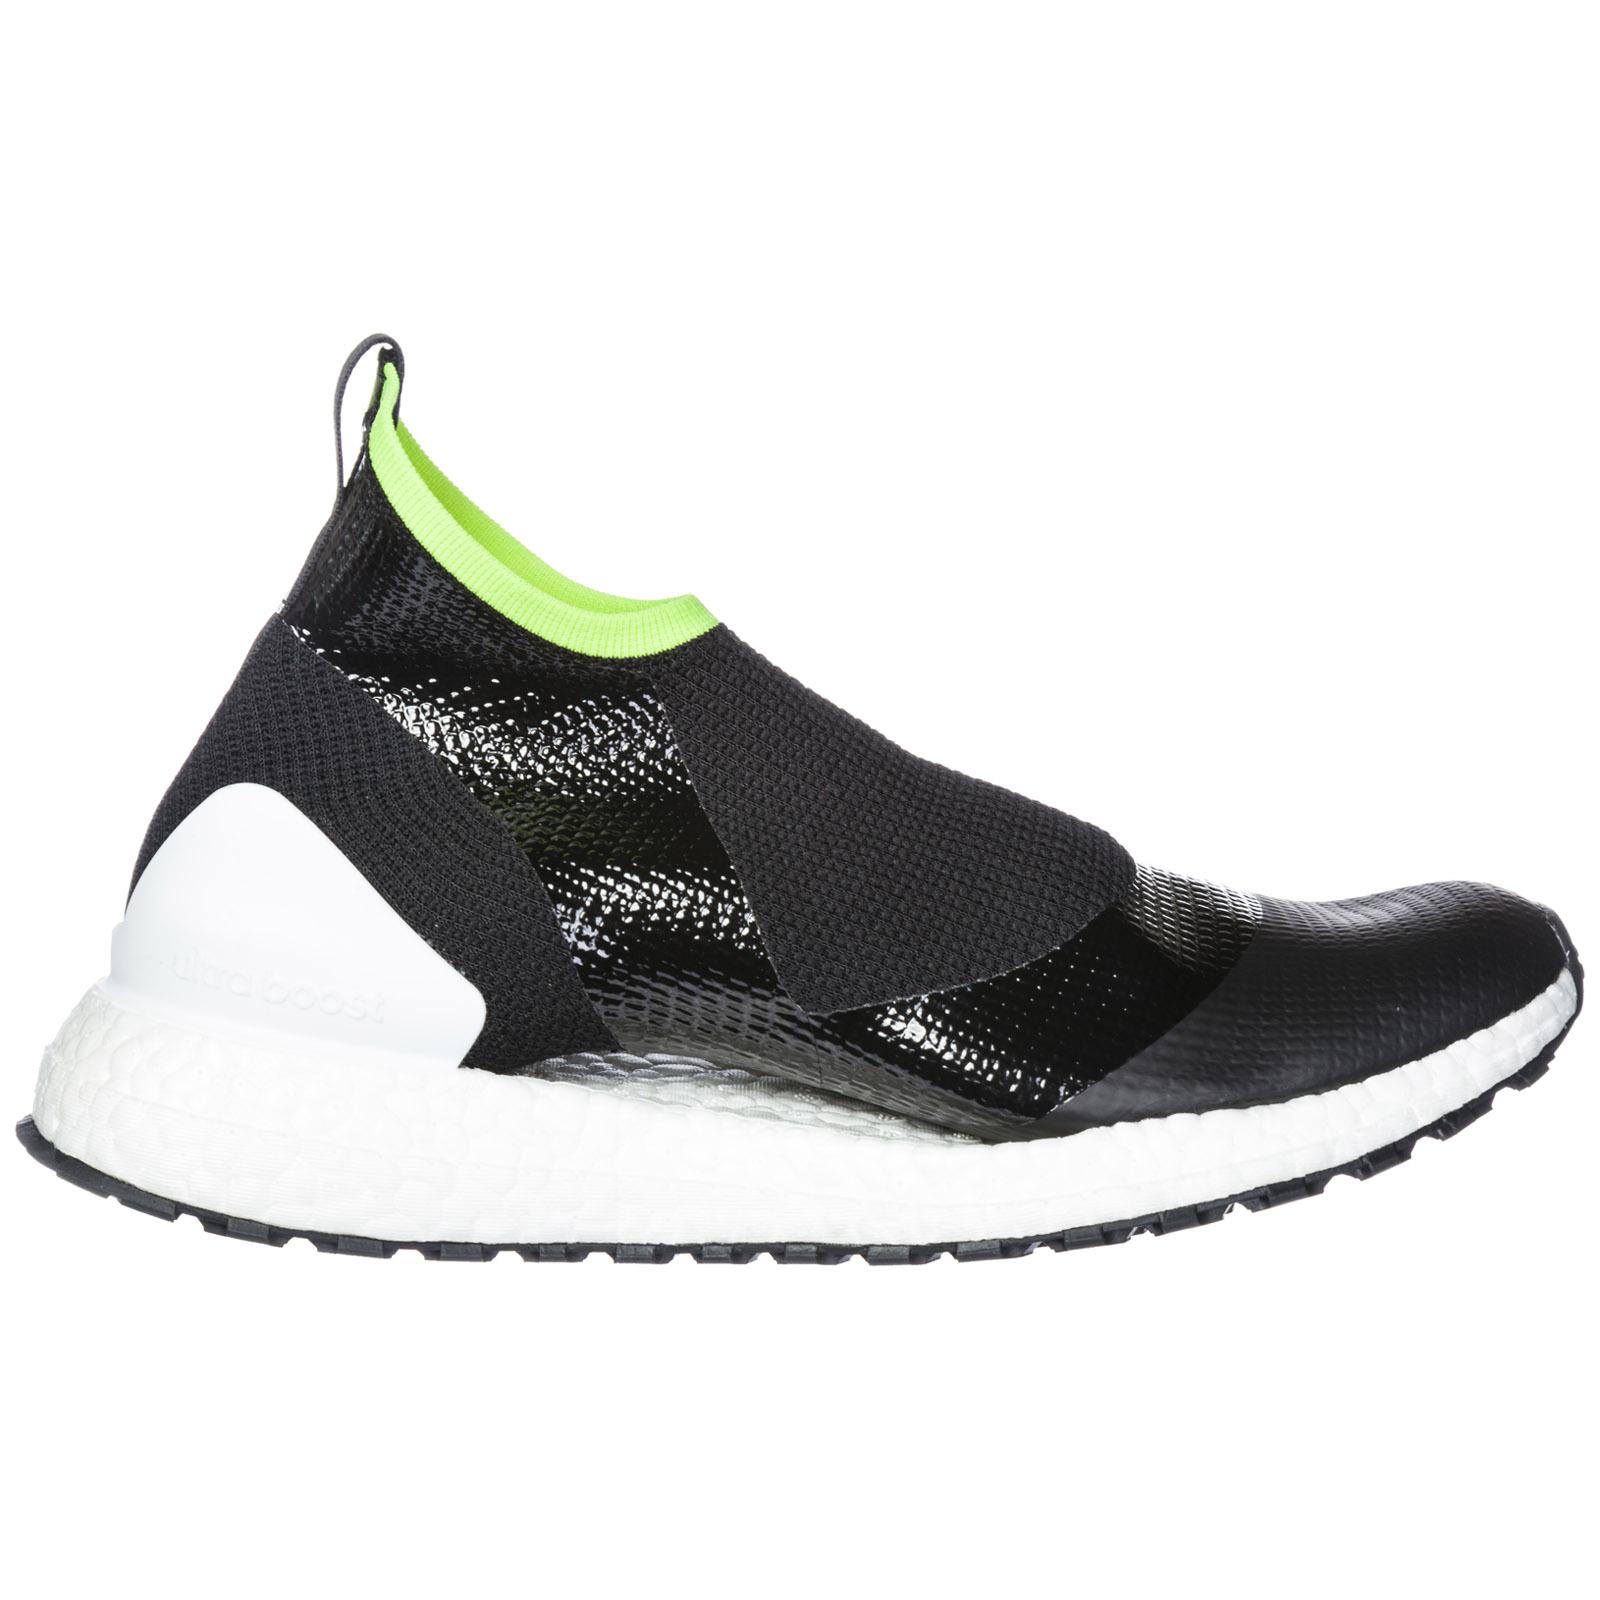 ab282712ce Scarpe slip on Adidas by Stella McCartney Ultraboost X AC7567 nero ...